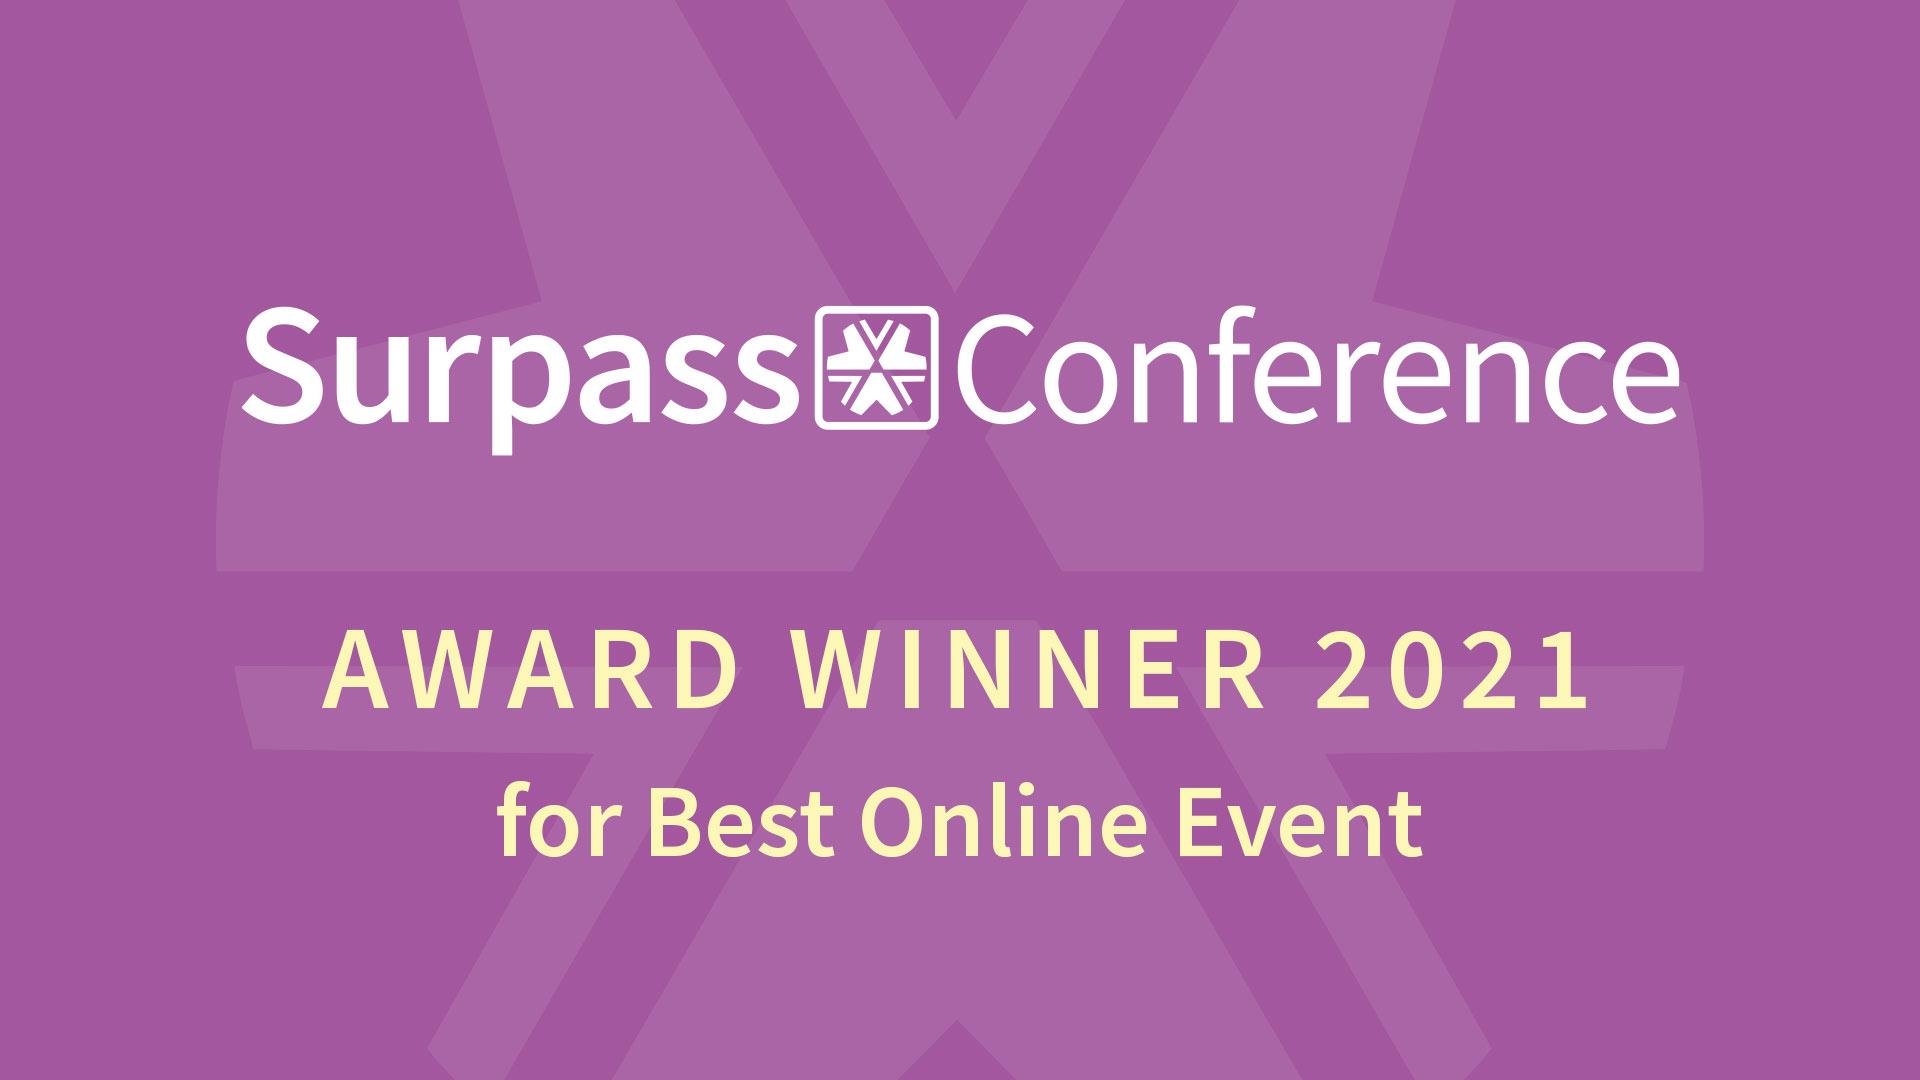 Surpass Conference Award Winner 2021 for Best Online Event